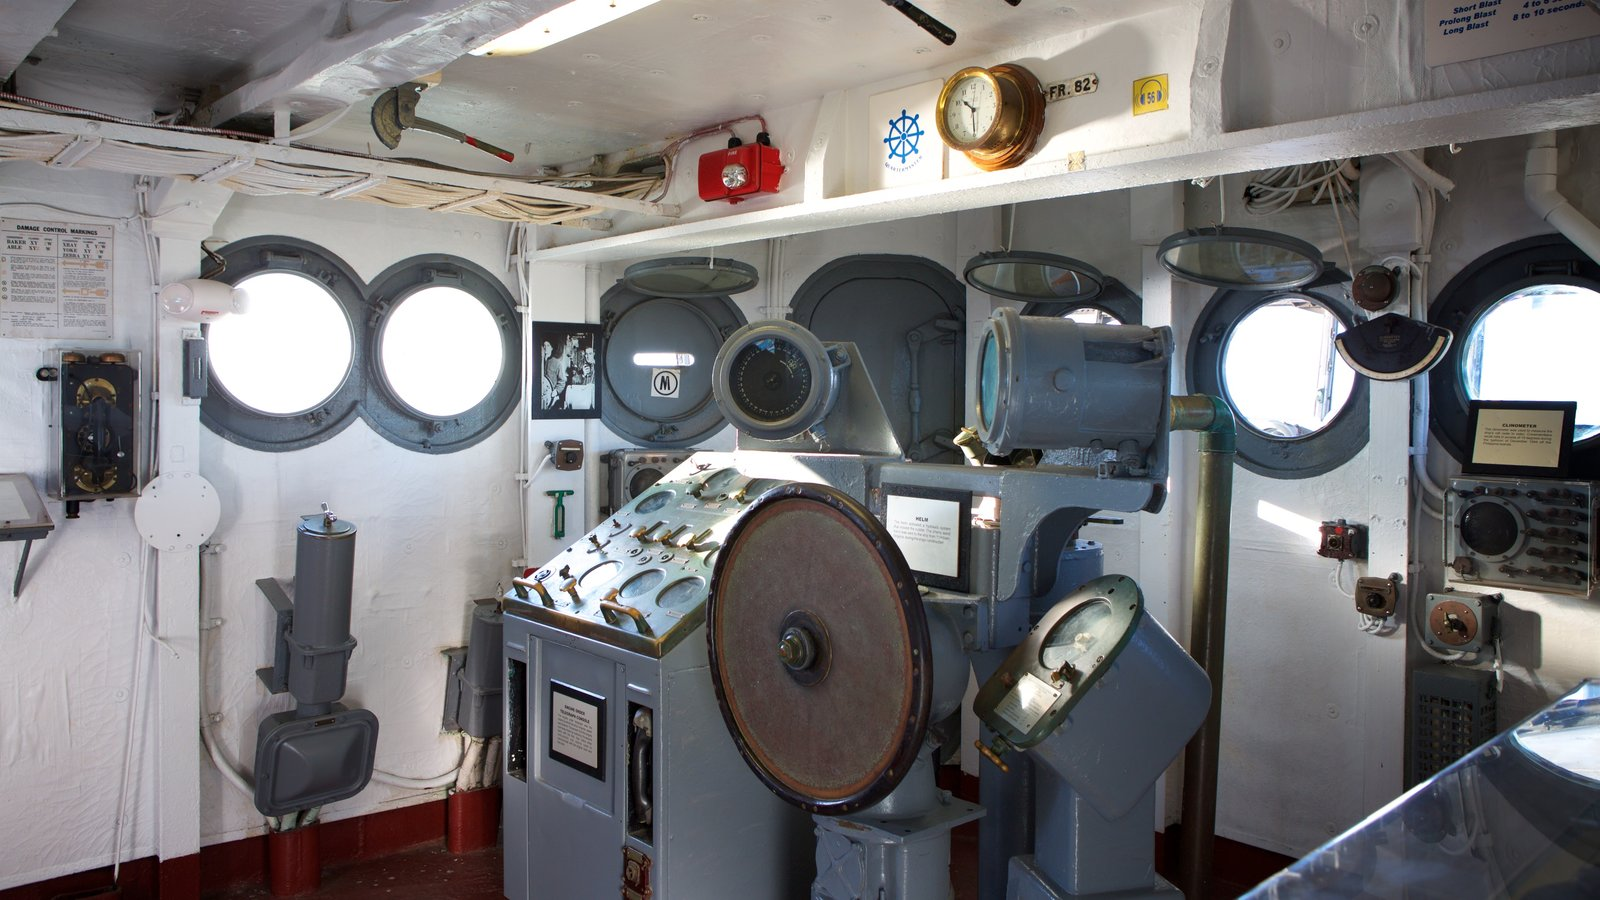 USS Yorktown caracterizando vistas internas e itens militares